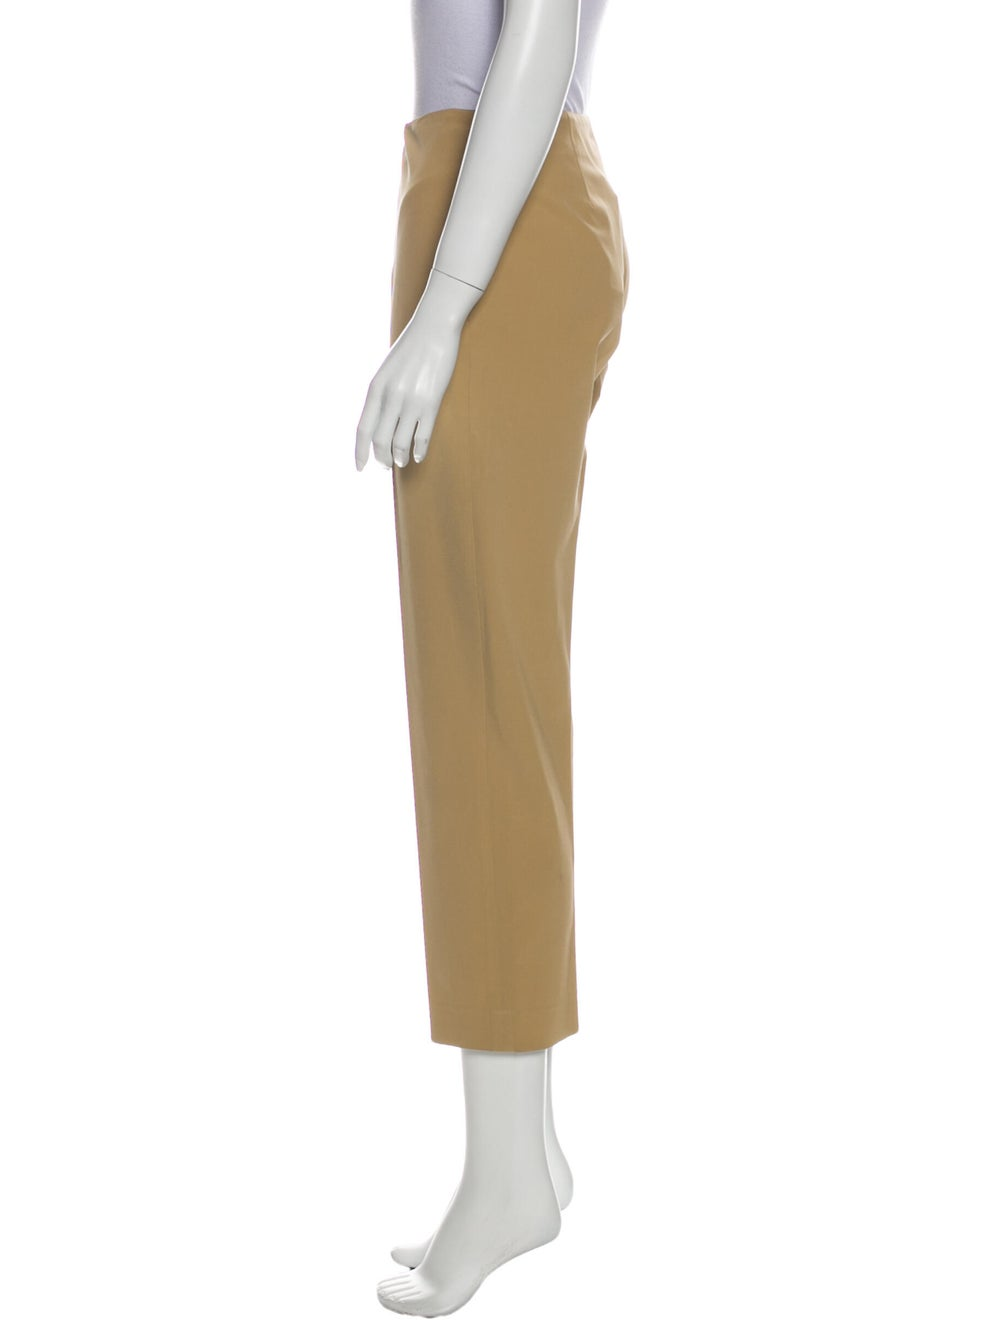 Prada Straight Leg Pants - image 2